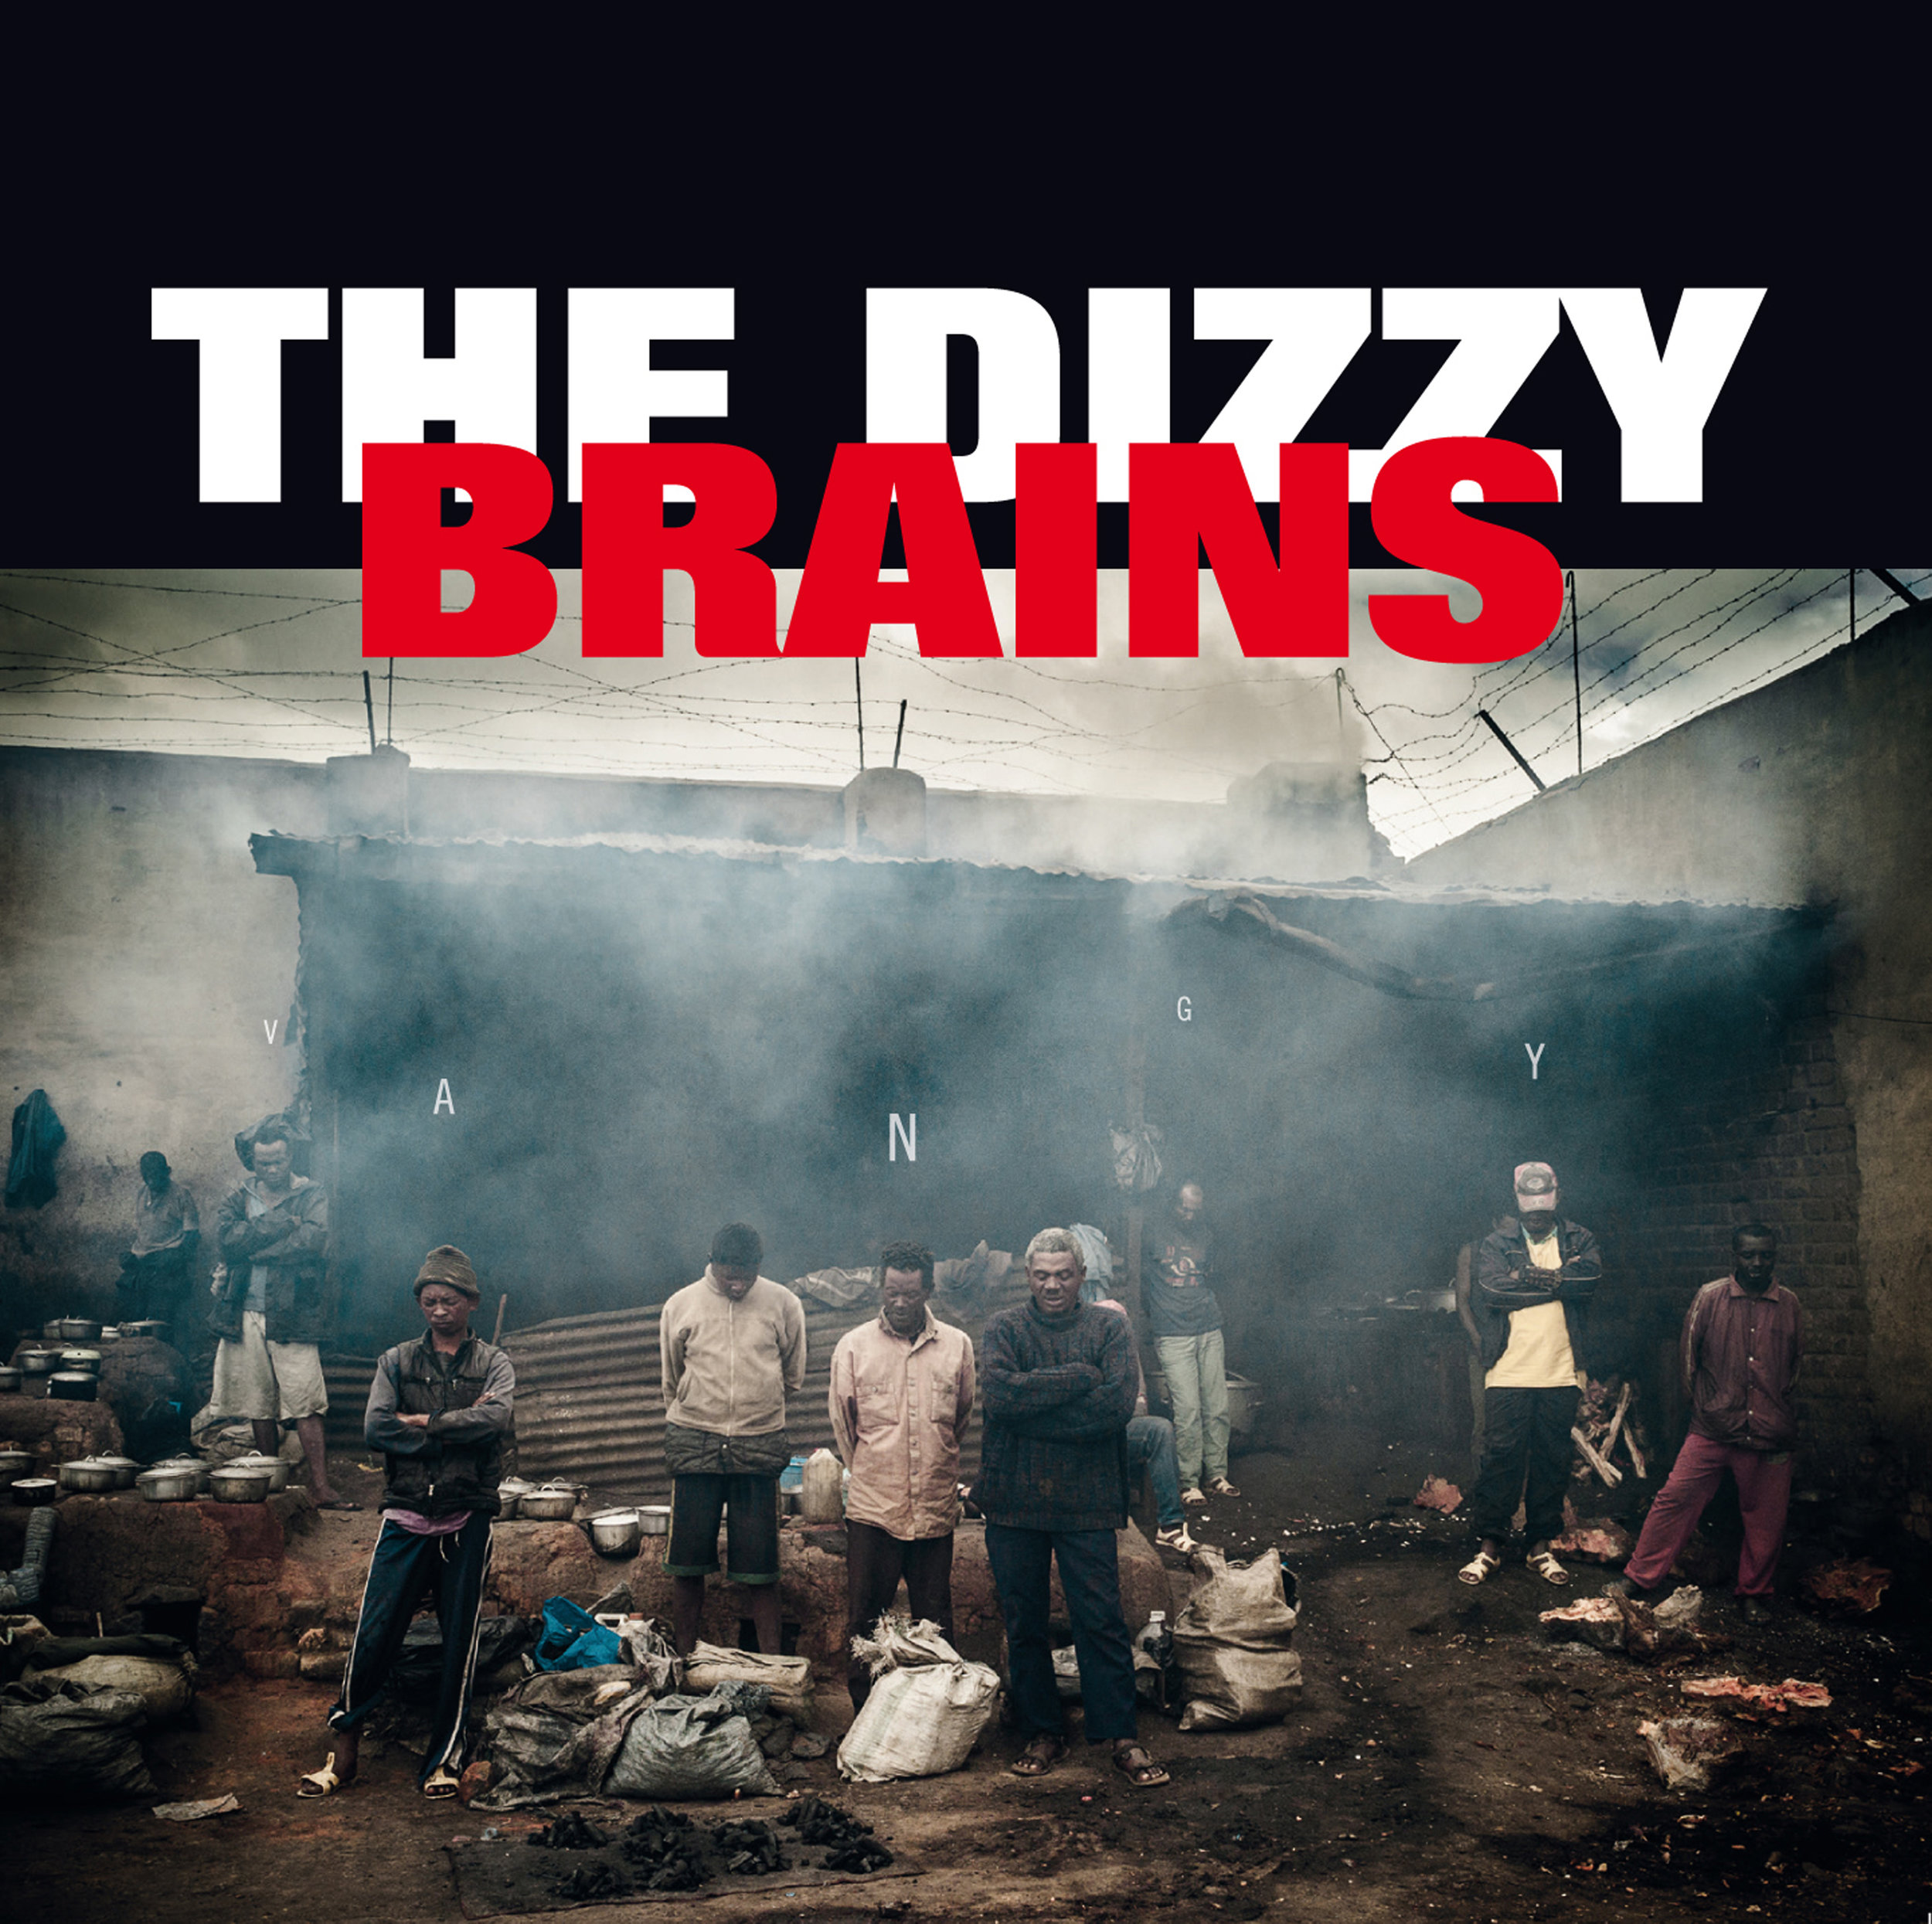 THE DIZZY BRAINS EP.jpg